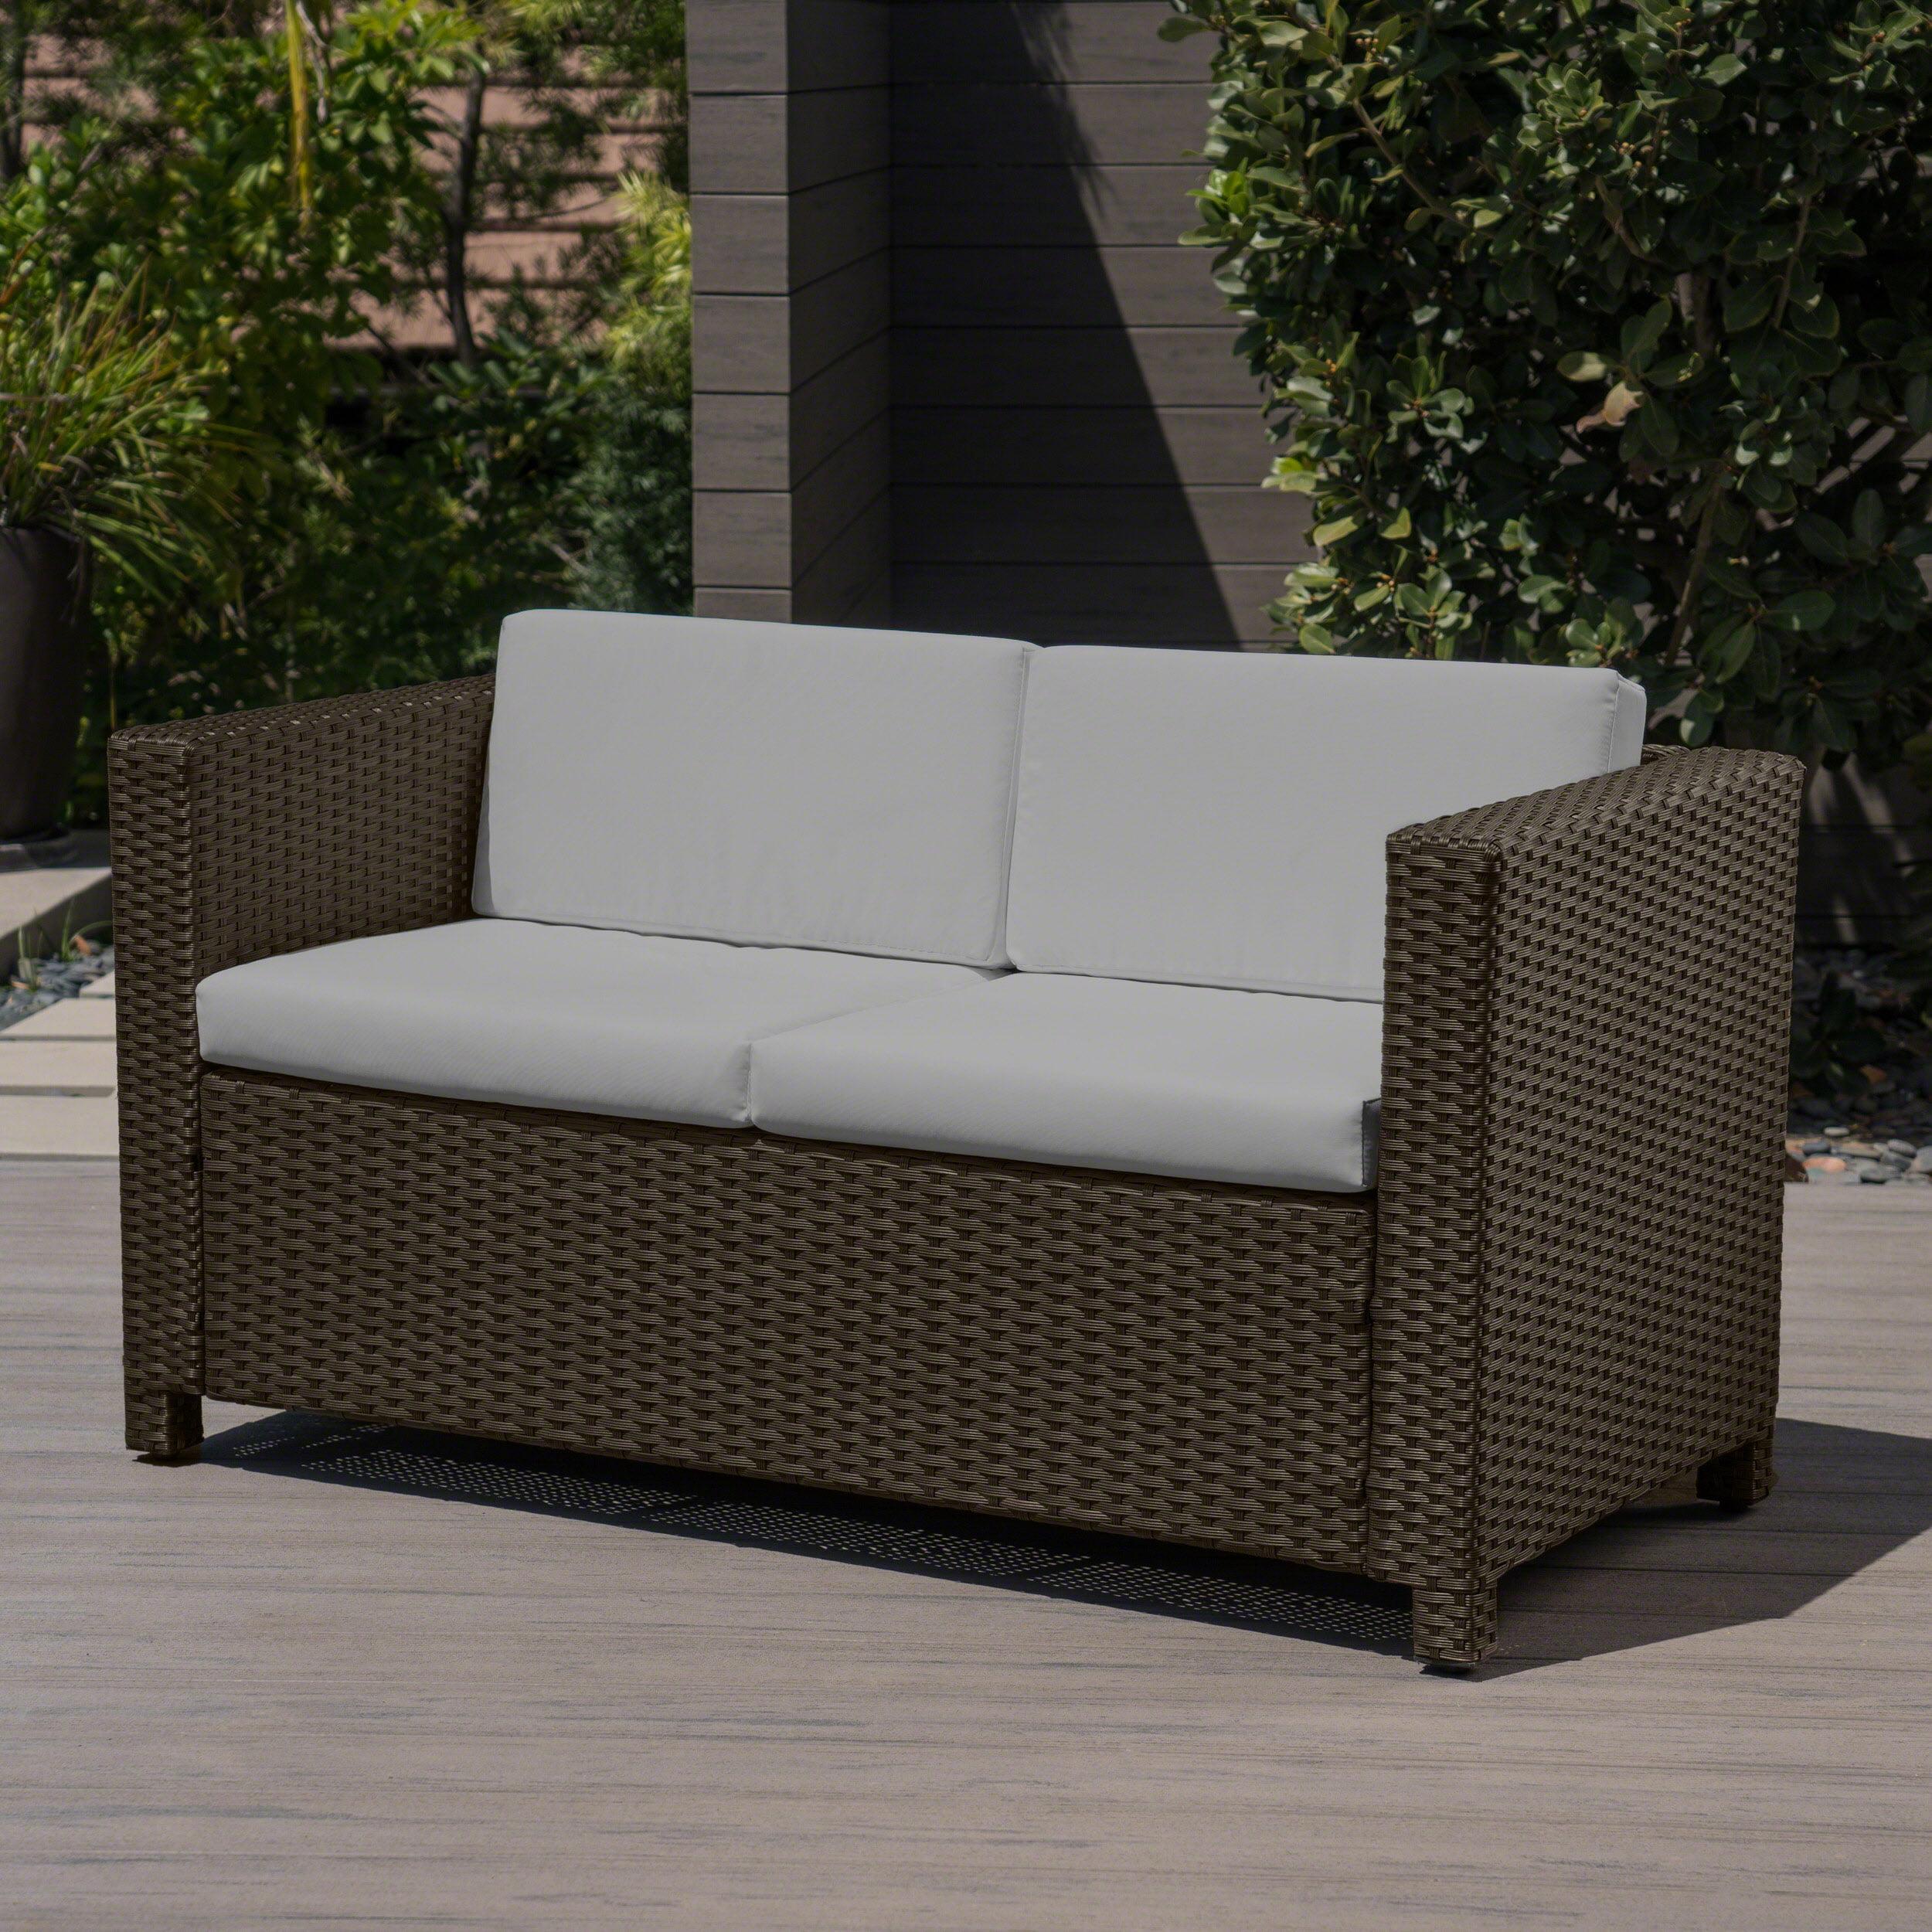 Pattillas Outdoor Wicker Loveseat with Cushions, Brown, Ceramic Grey